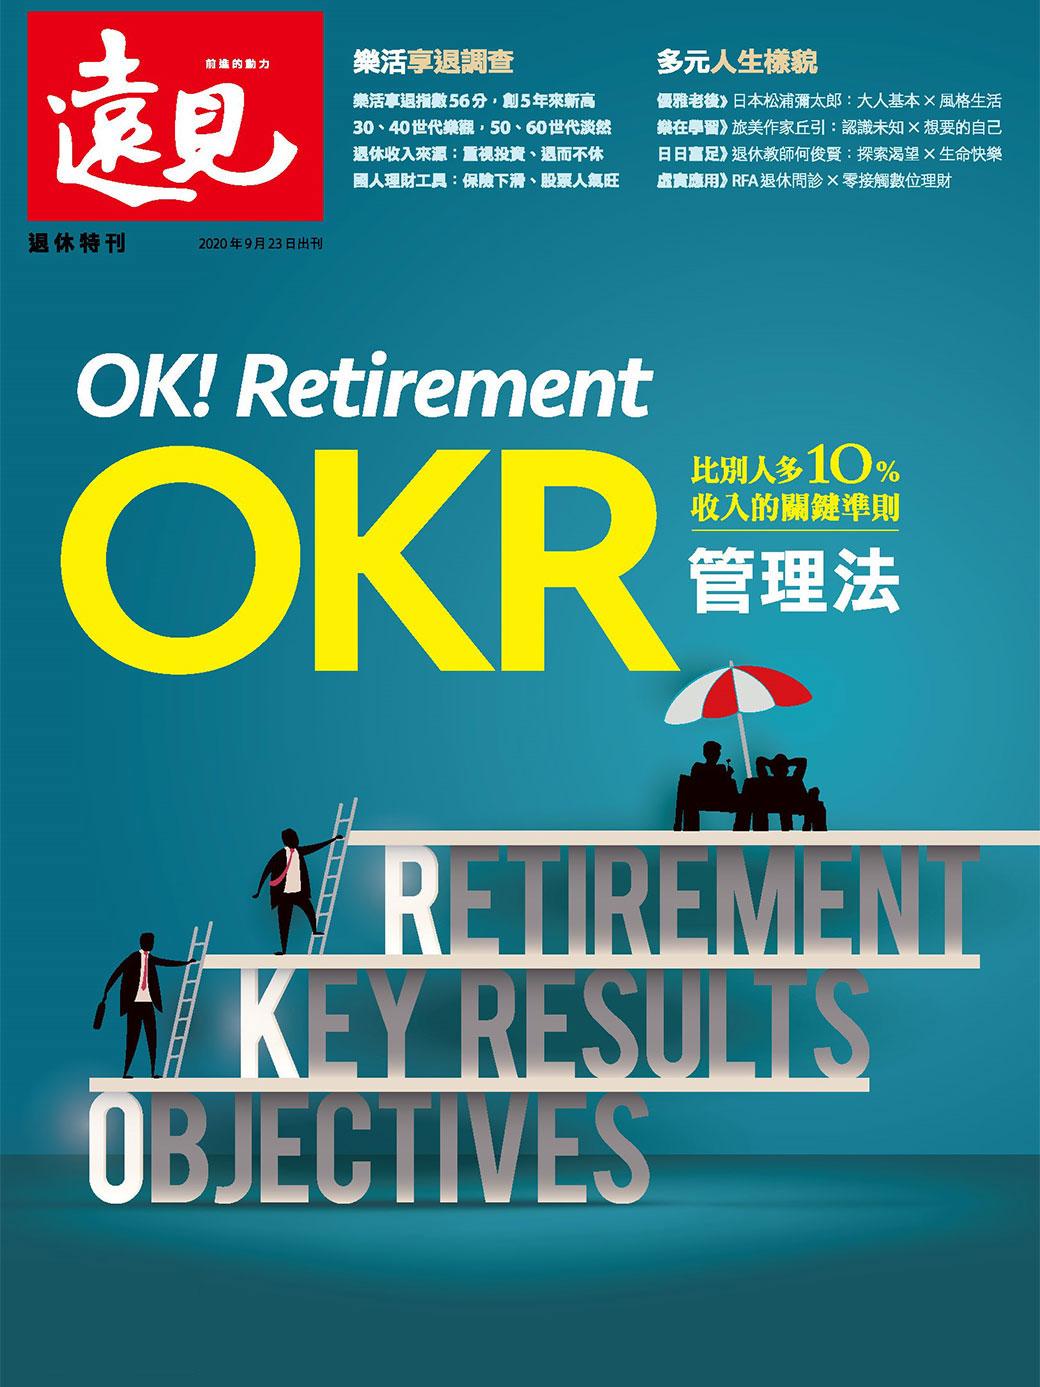 OK!Retirement 比別人收入多10%的關鍵準則